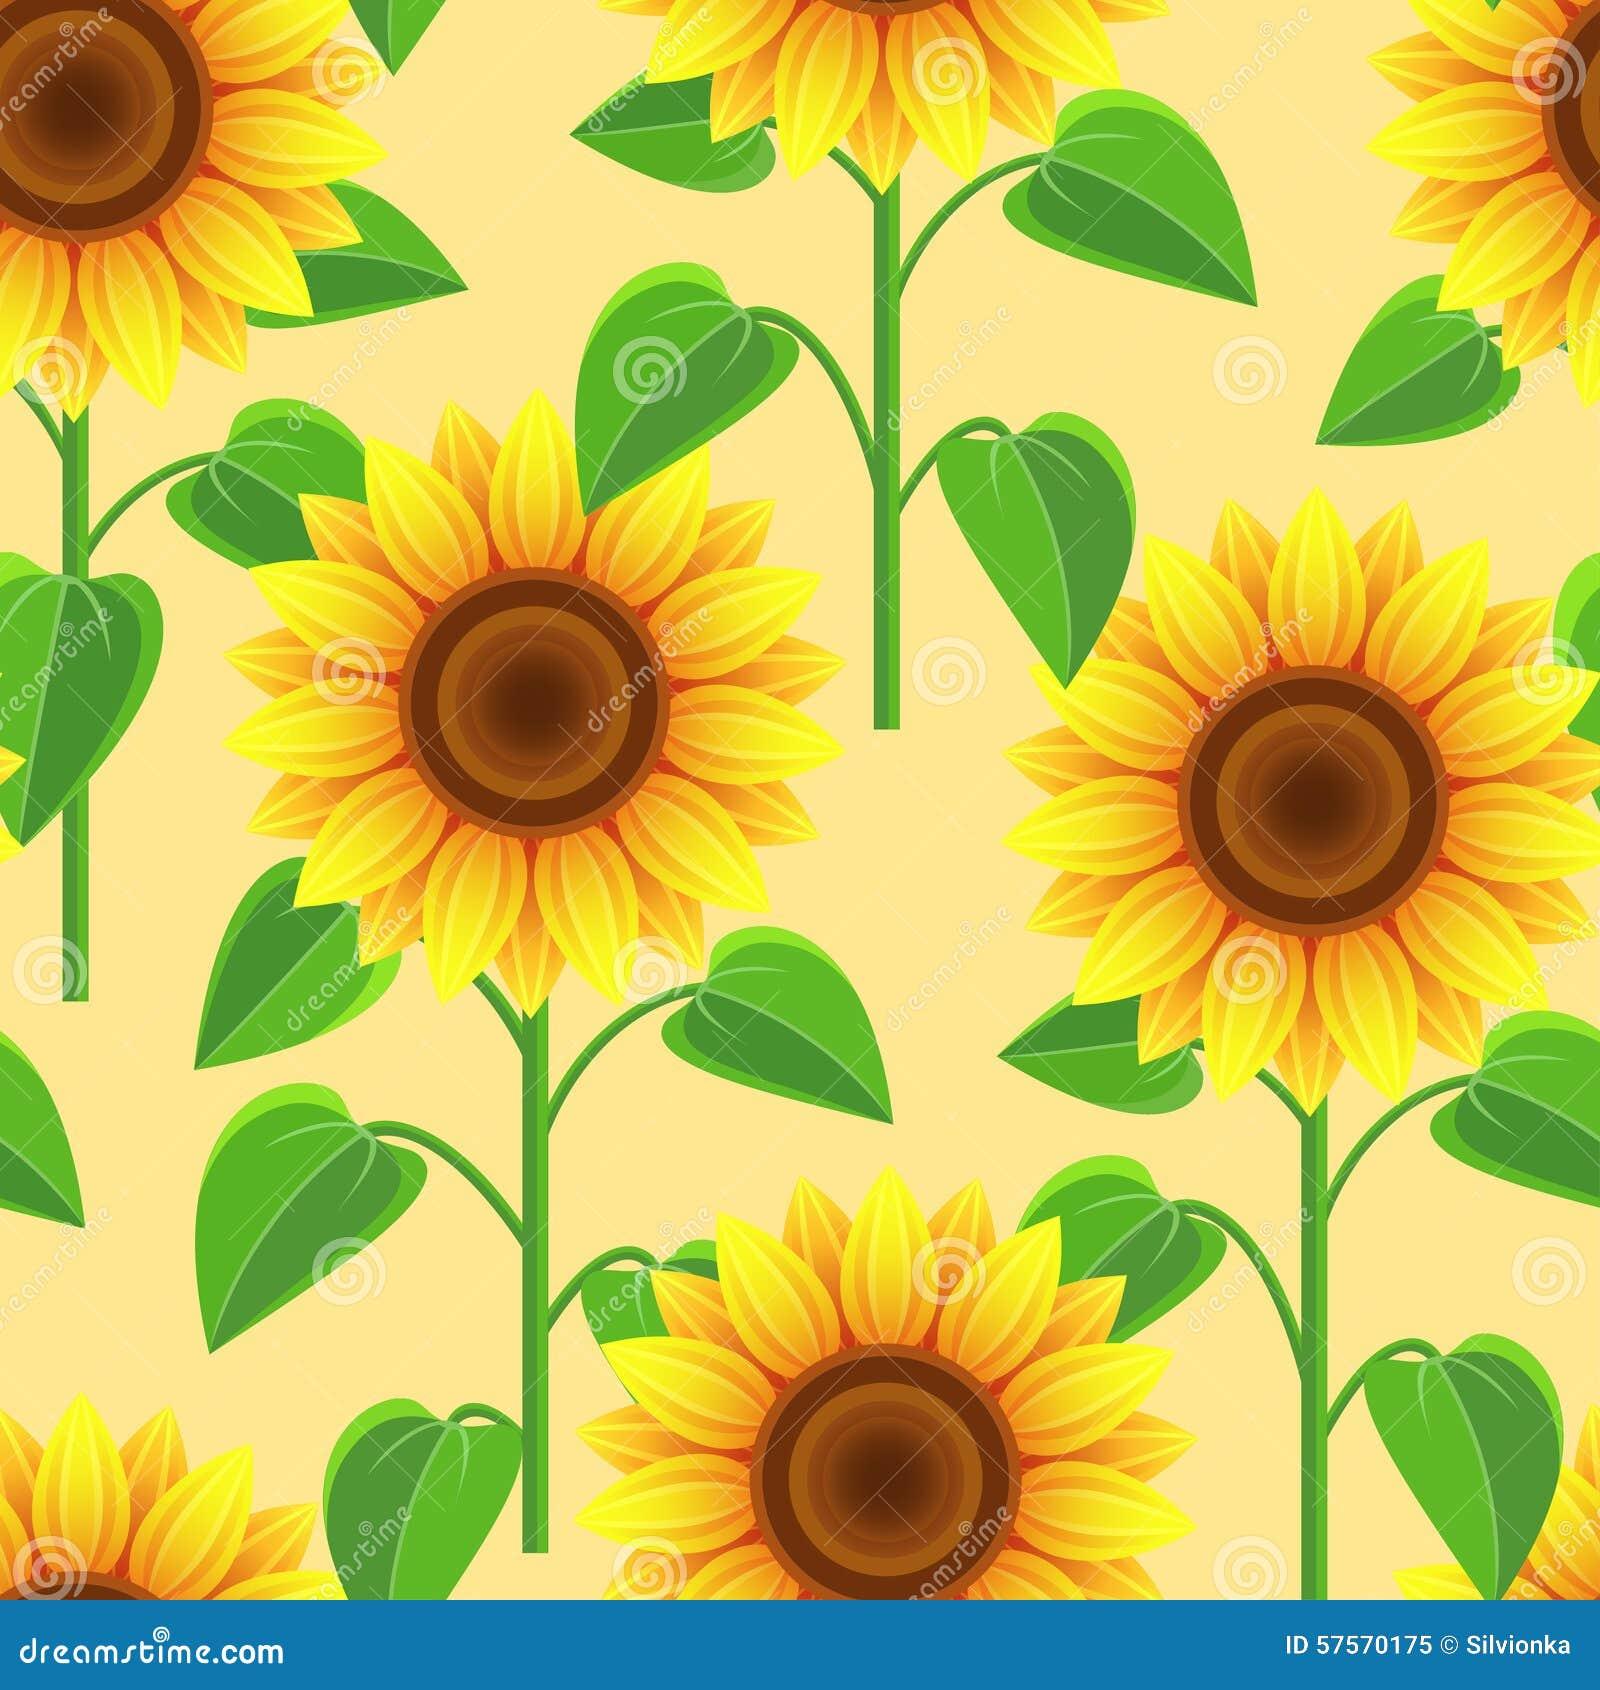 Seamless pattern with flowers sunflowers stock vector illustration seamless pattern with flowers sunflowers izmirmasajfo